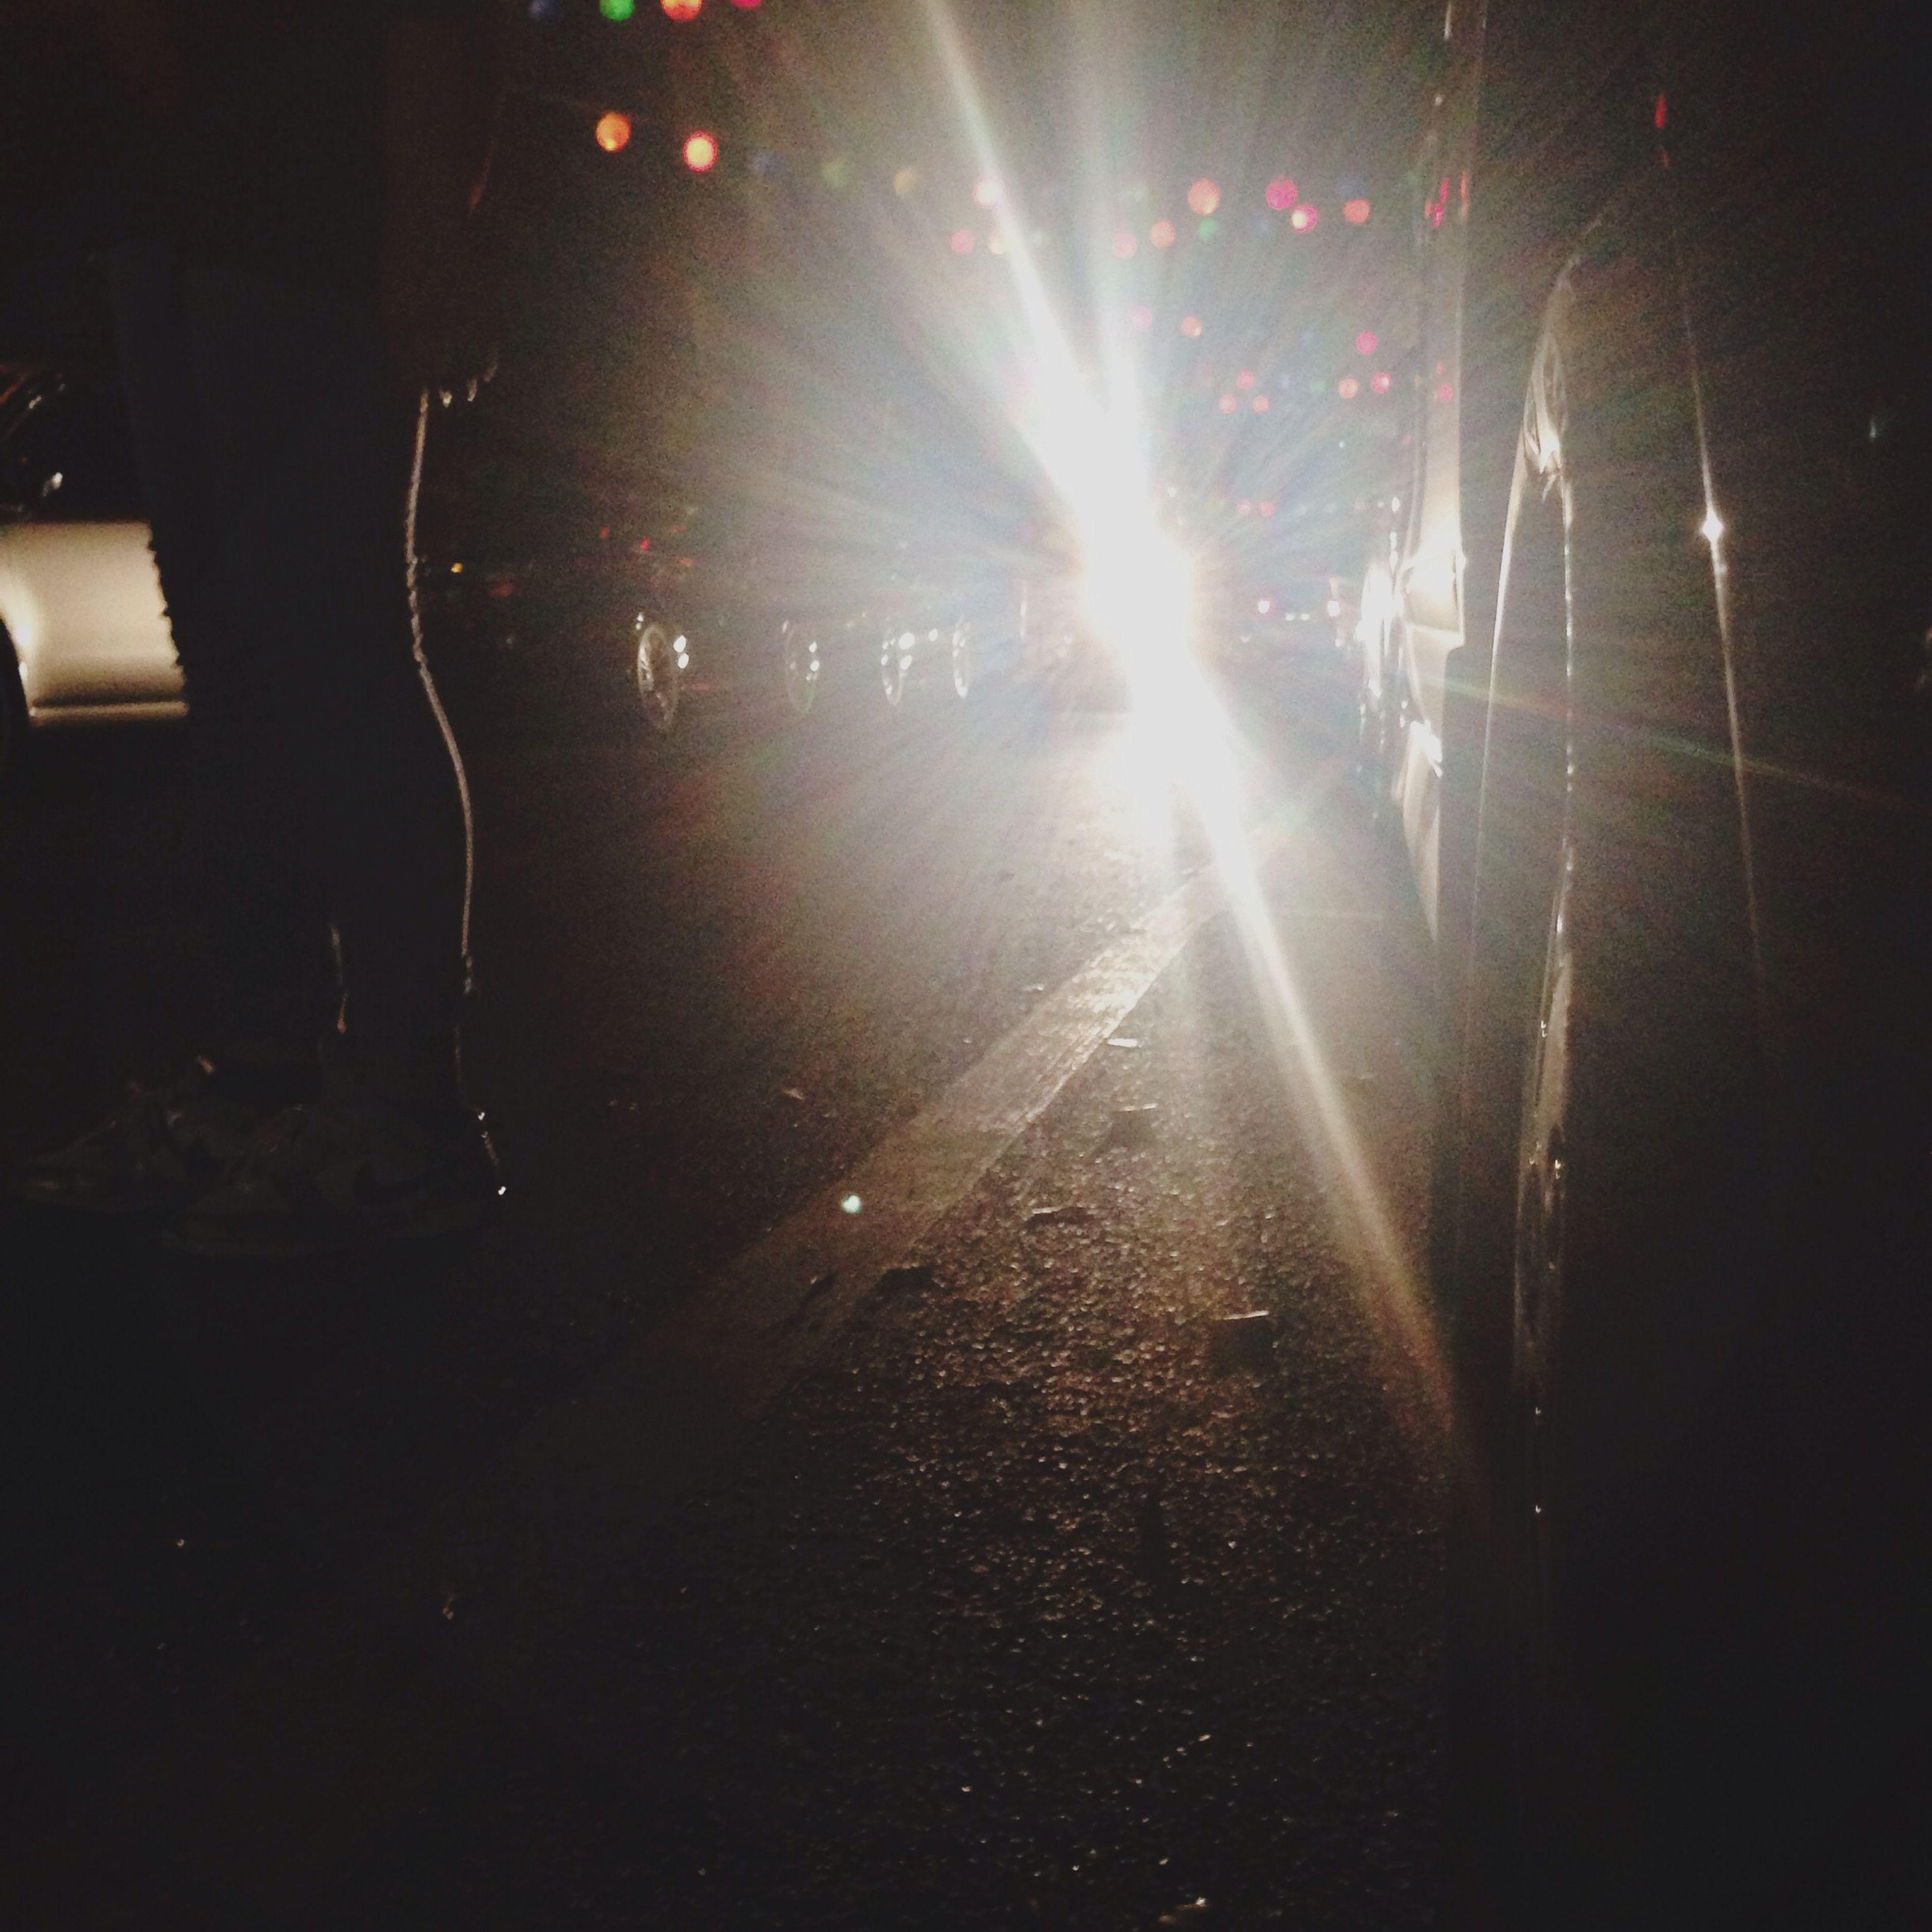 illuminated, night, light - natural phenomenon, lighting equipment, indoors, dark, glowing, transportation, lens flare, light, street, no people, road, sunlight, light beam, motion, the way forward, street light, electric light